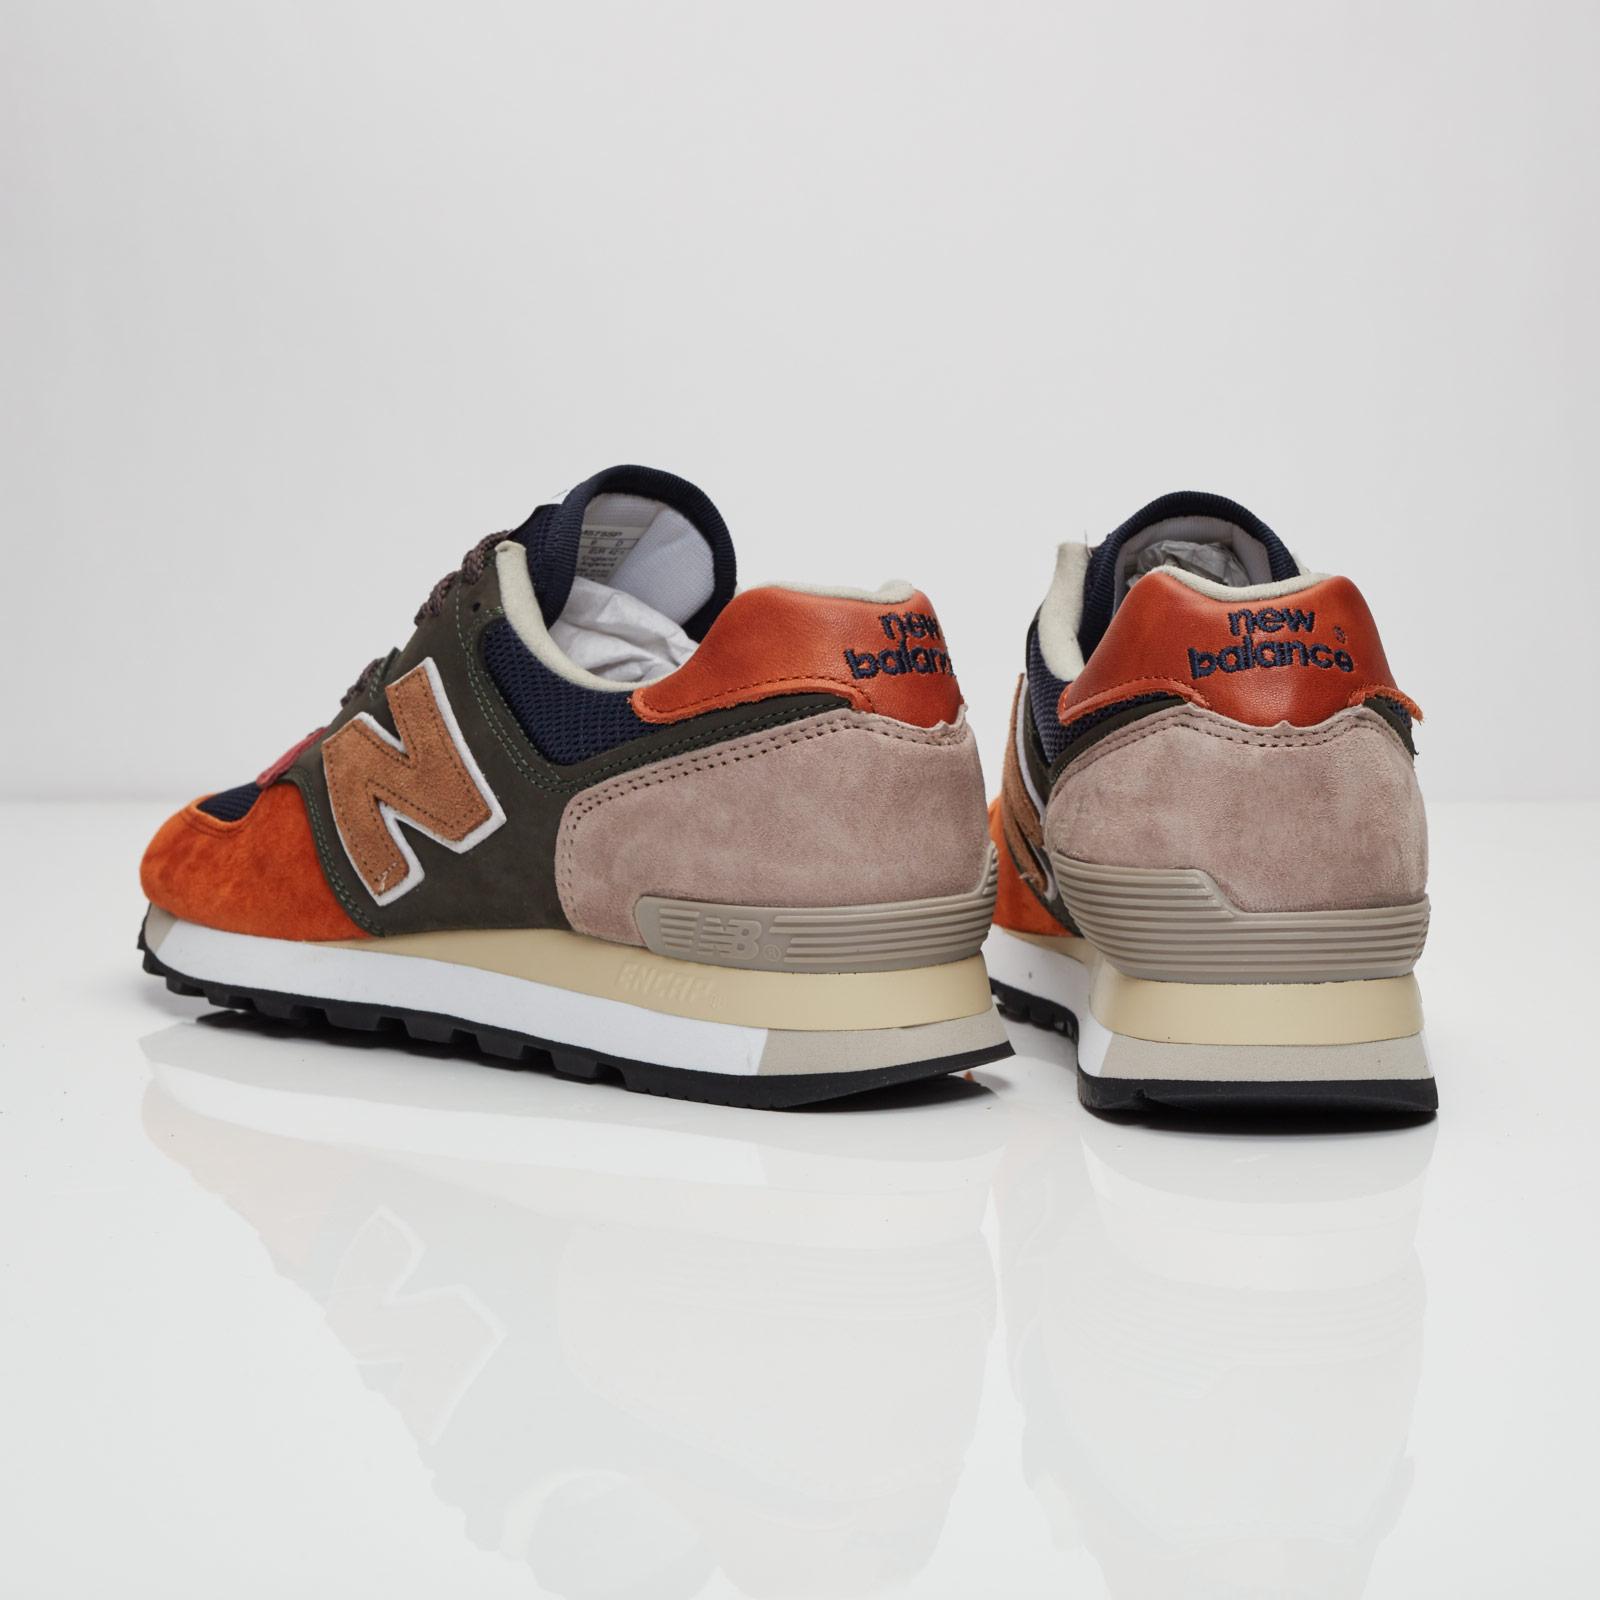 New Balance M575 - M575sp - Sneakersnstuff | sneakers & streetwear ...